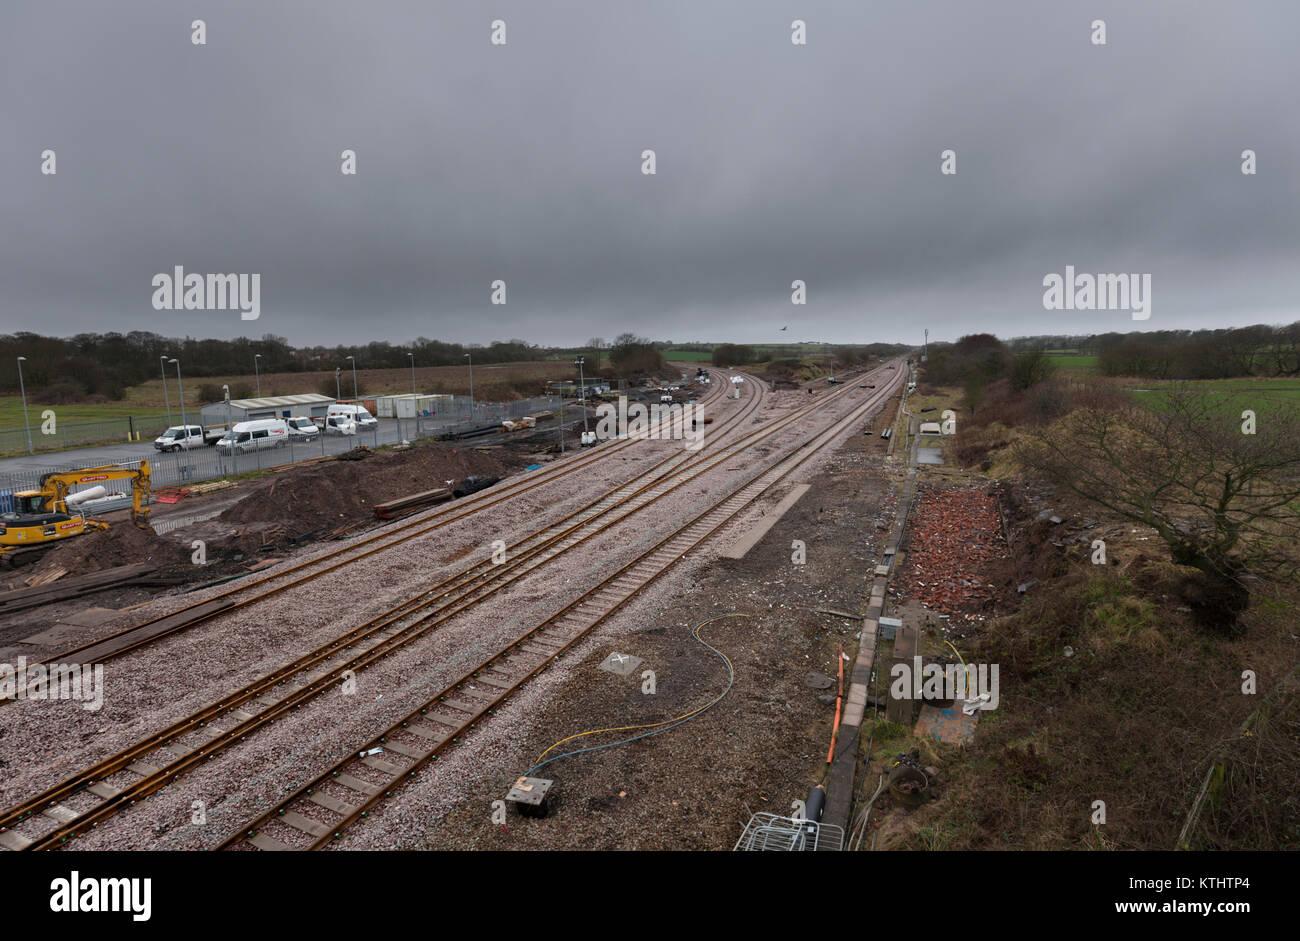 Track Layout Stockfotos & Track Layout Bilder - Alamy